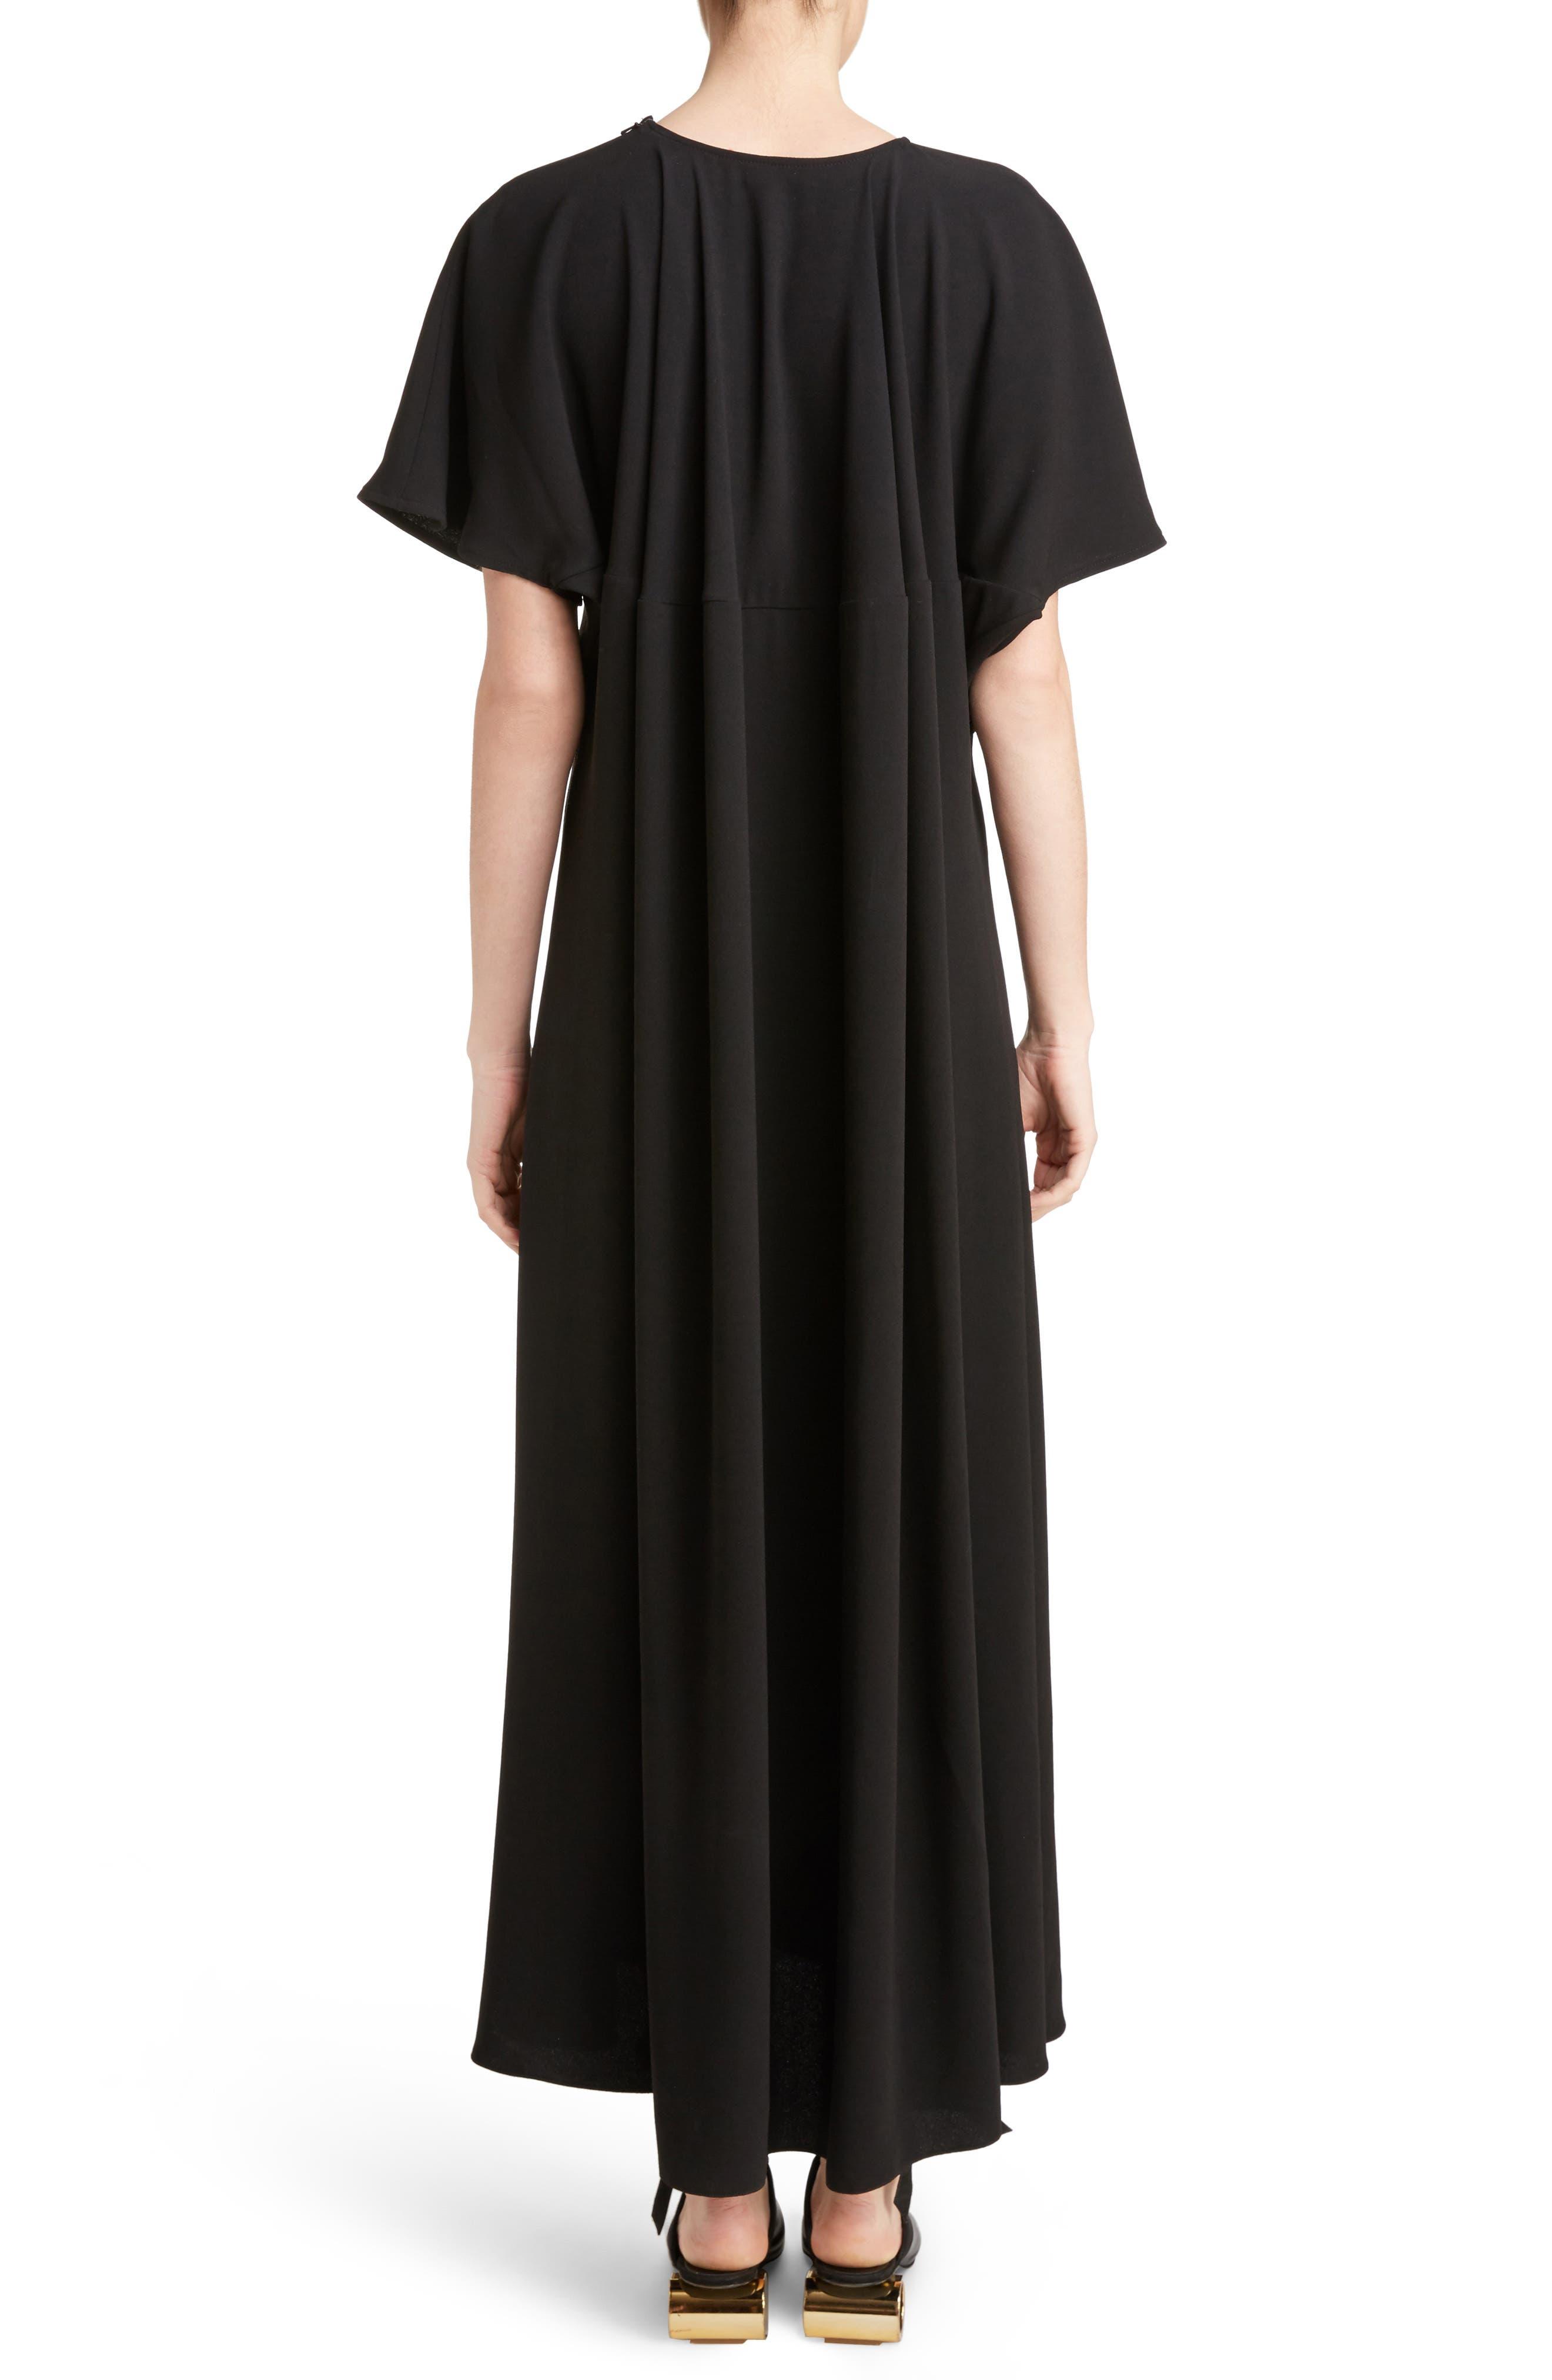 J.W.ANDERSON Cap Sleeve Maxi Dress,                             Alternate thumbnail 2, color,                             001